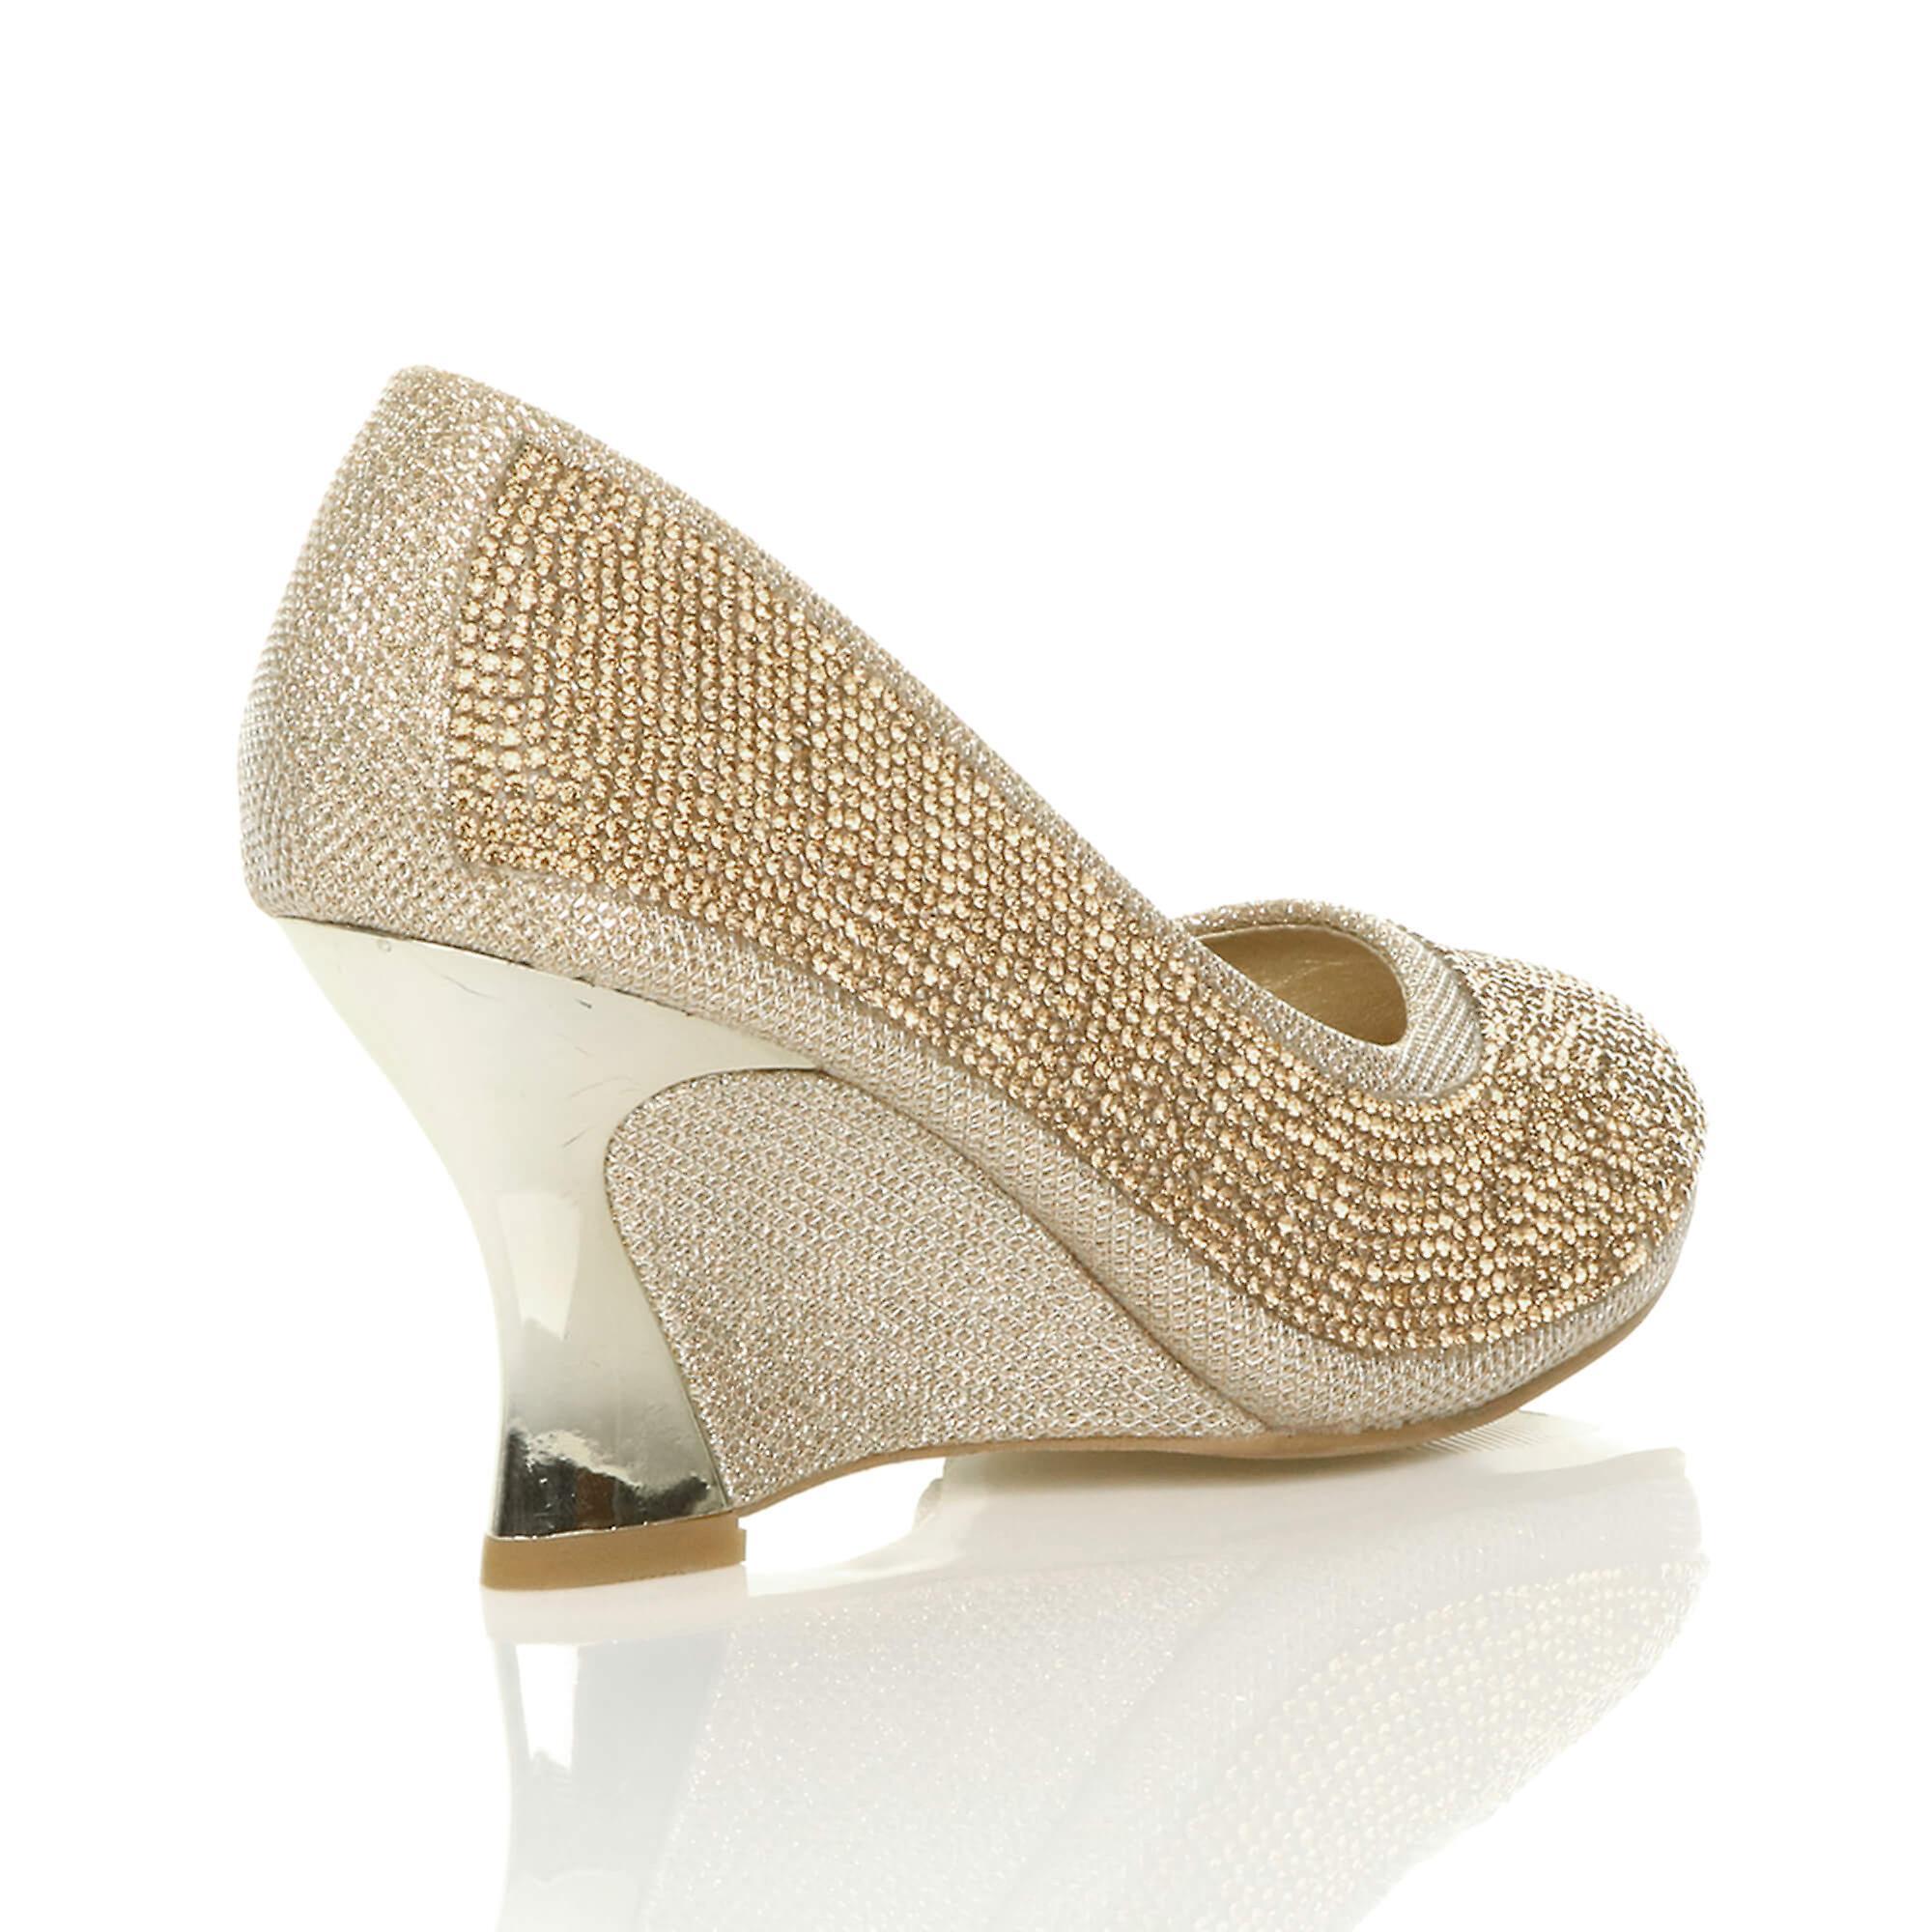 wedding evening wedge pumps womens Ajvani diamante platform heel bridal mid shoes court prom qYSwxO8g